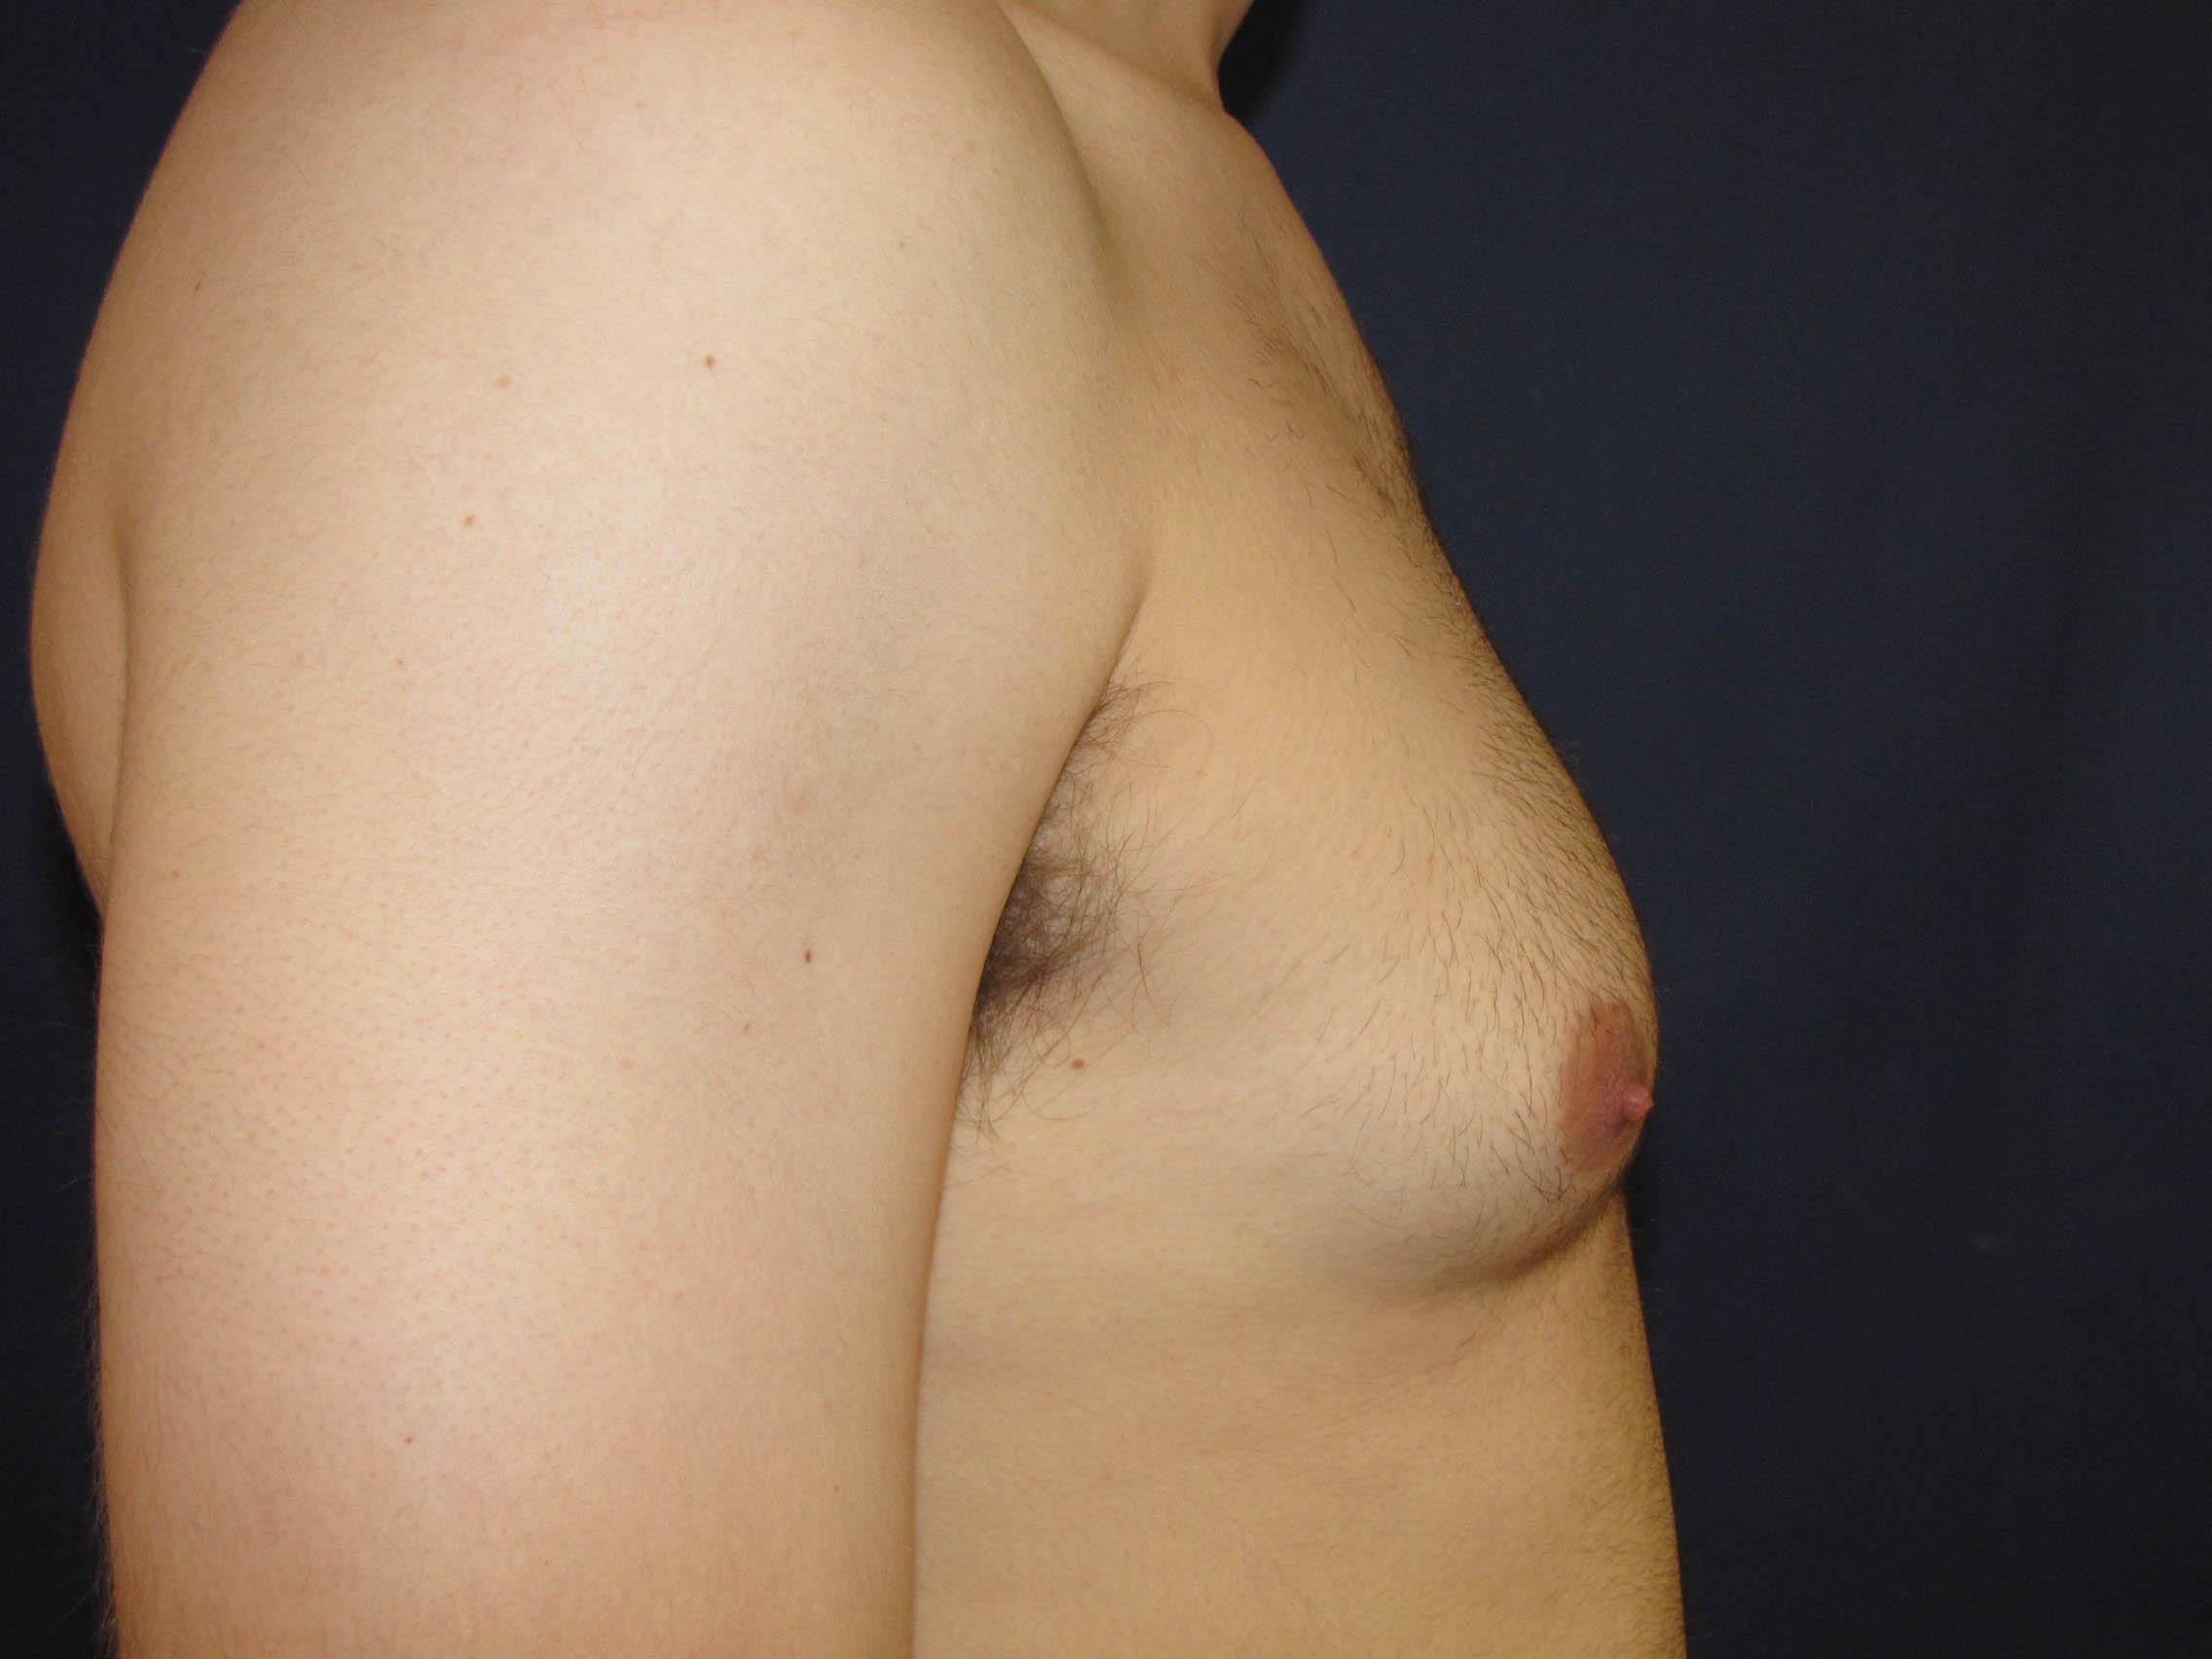 Male breast reduction in san antonio, tx